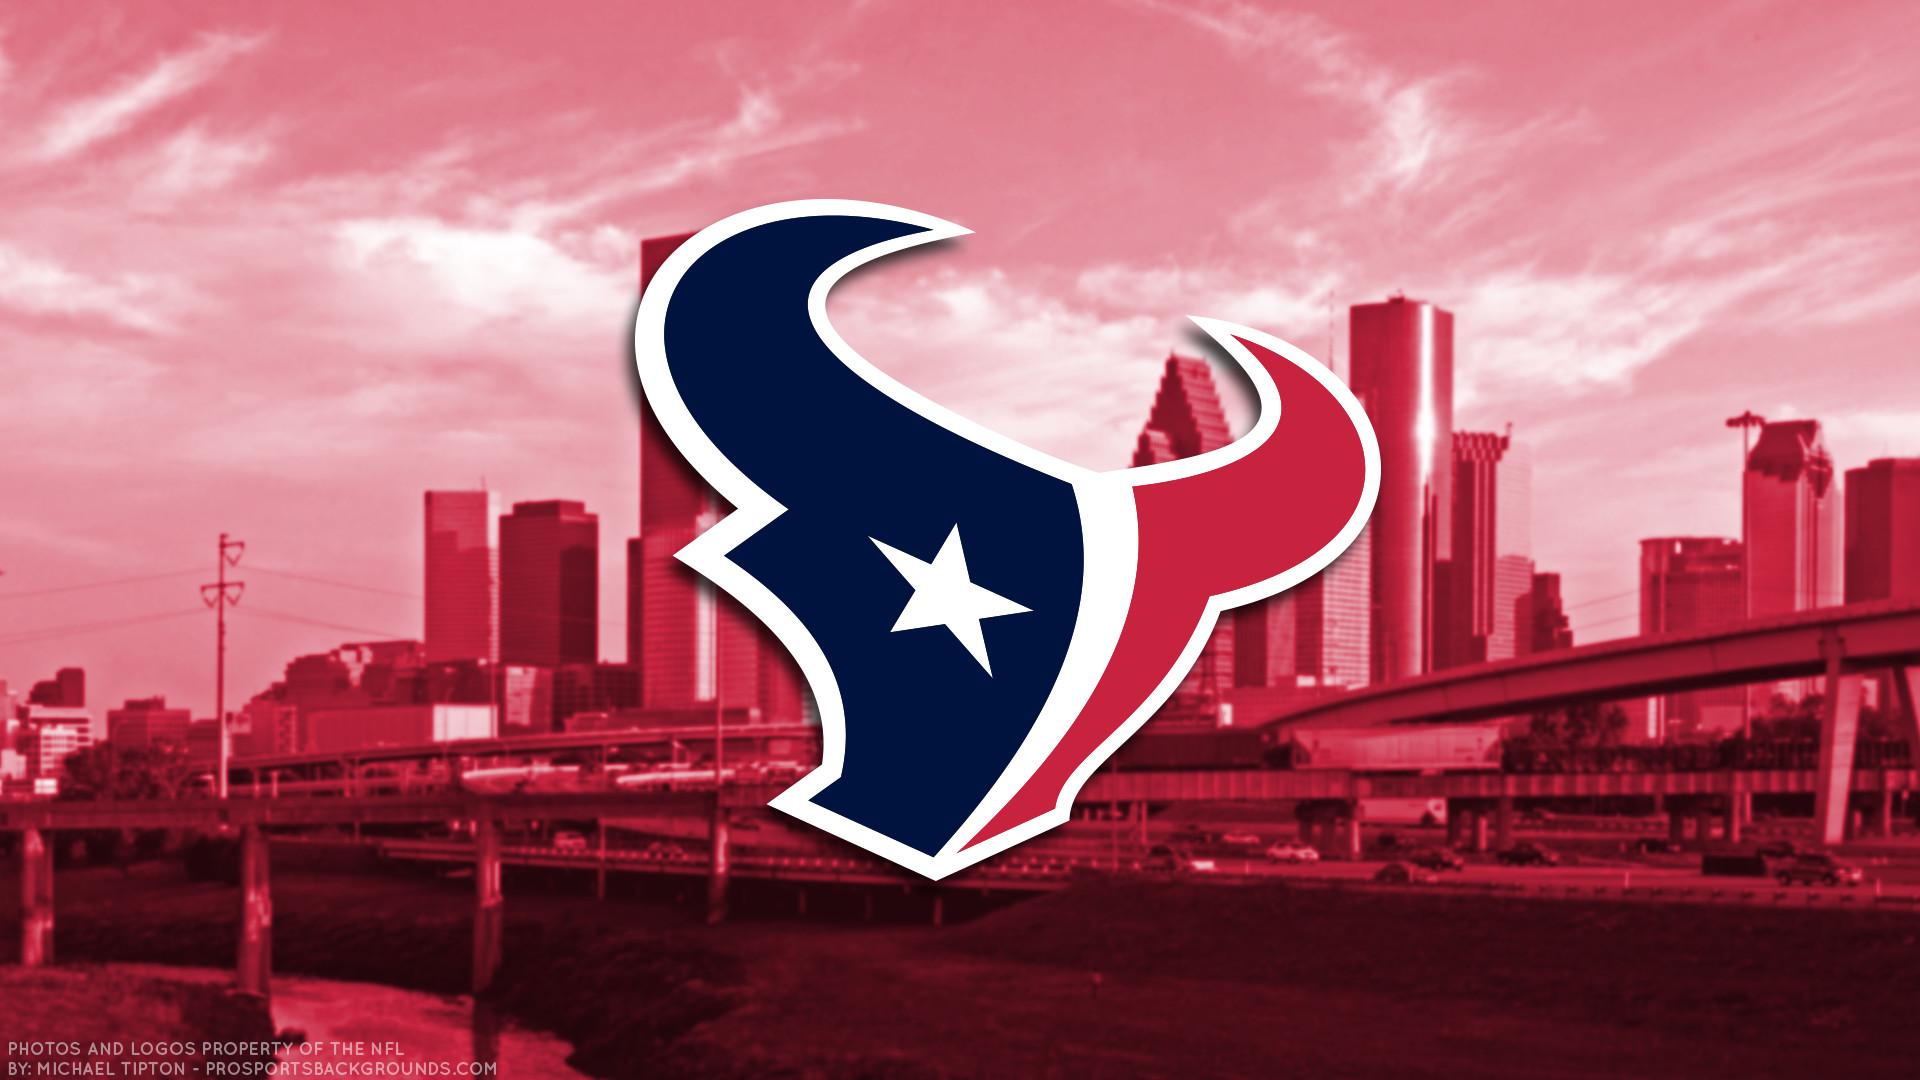 1920x1080 Nfl 2016 Houston Texans Desktop Schedule Background Logo